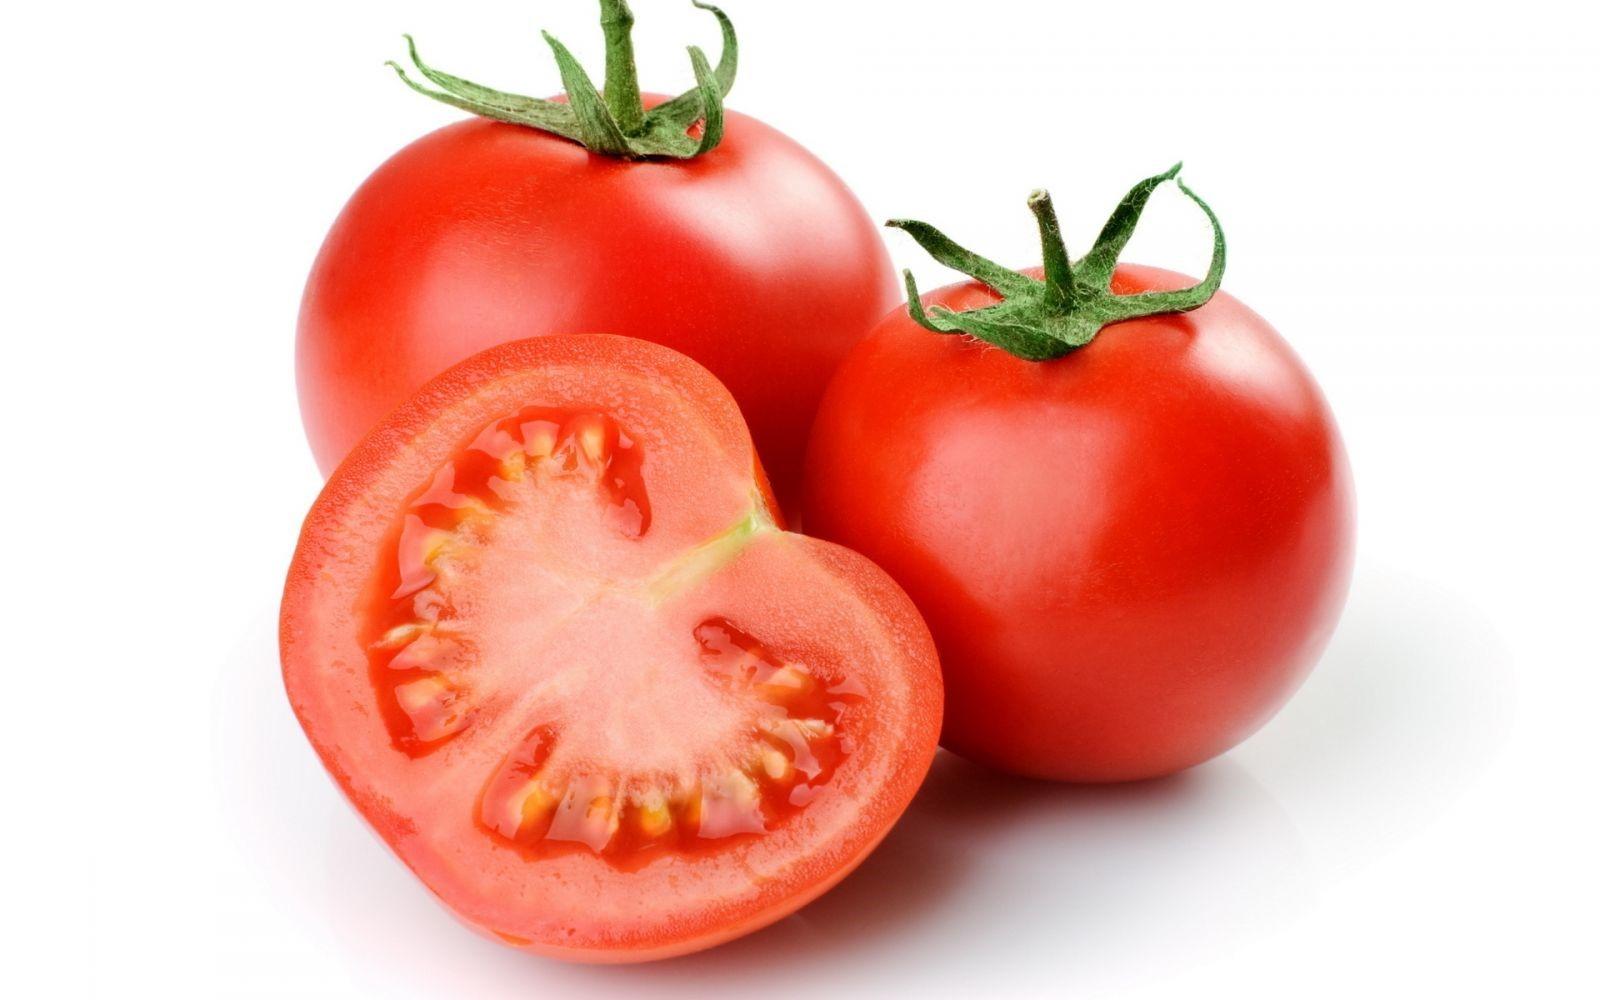 rau củ giảm cân nhanh - cà chua